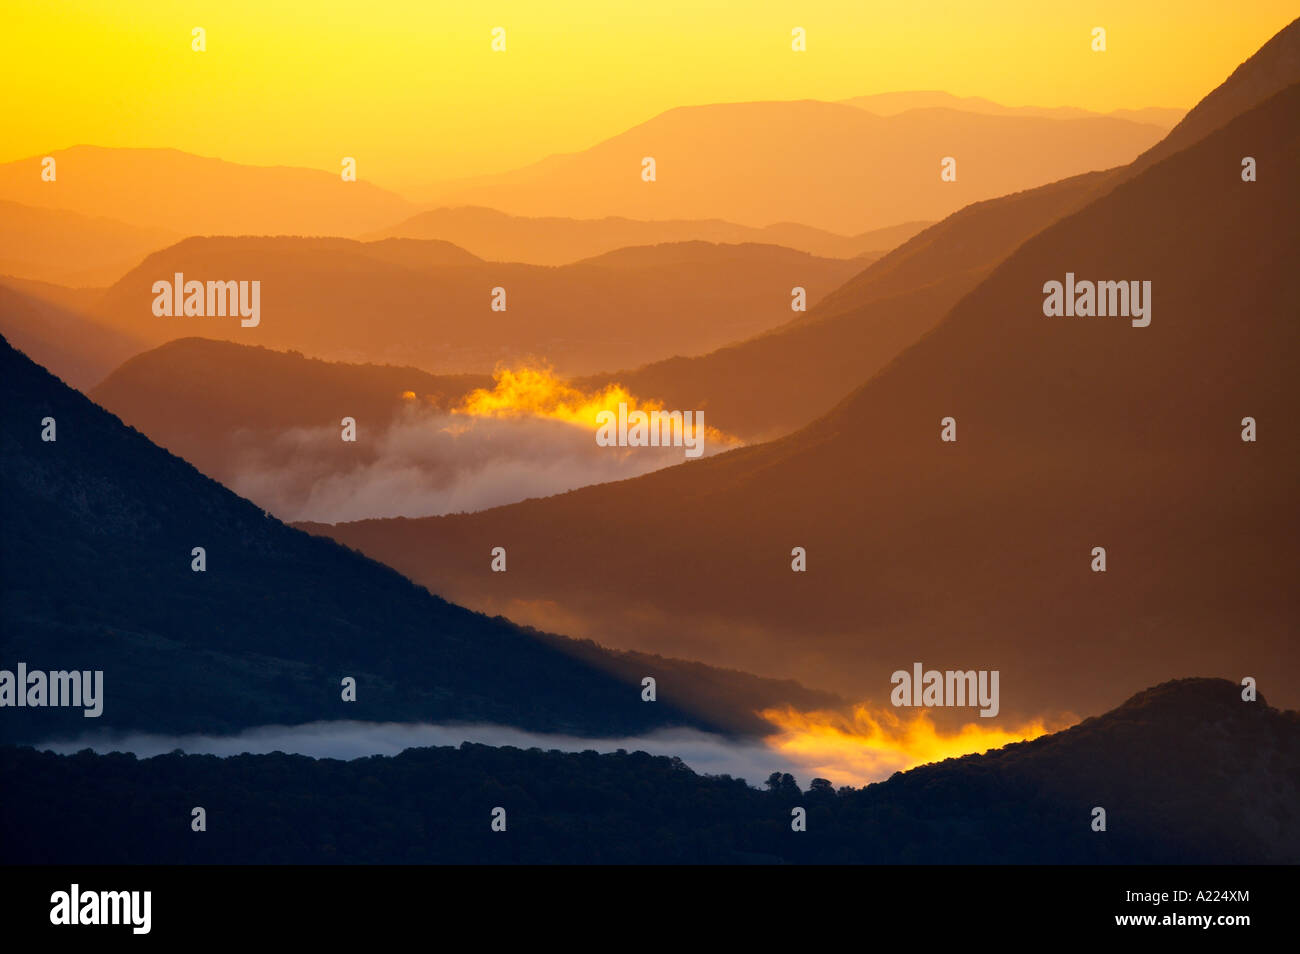 Nebel, wirbelnden, Abruzzen Nationalpark Abruzzen Italien NR Stockbild